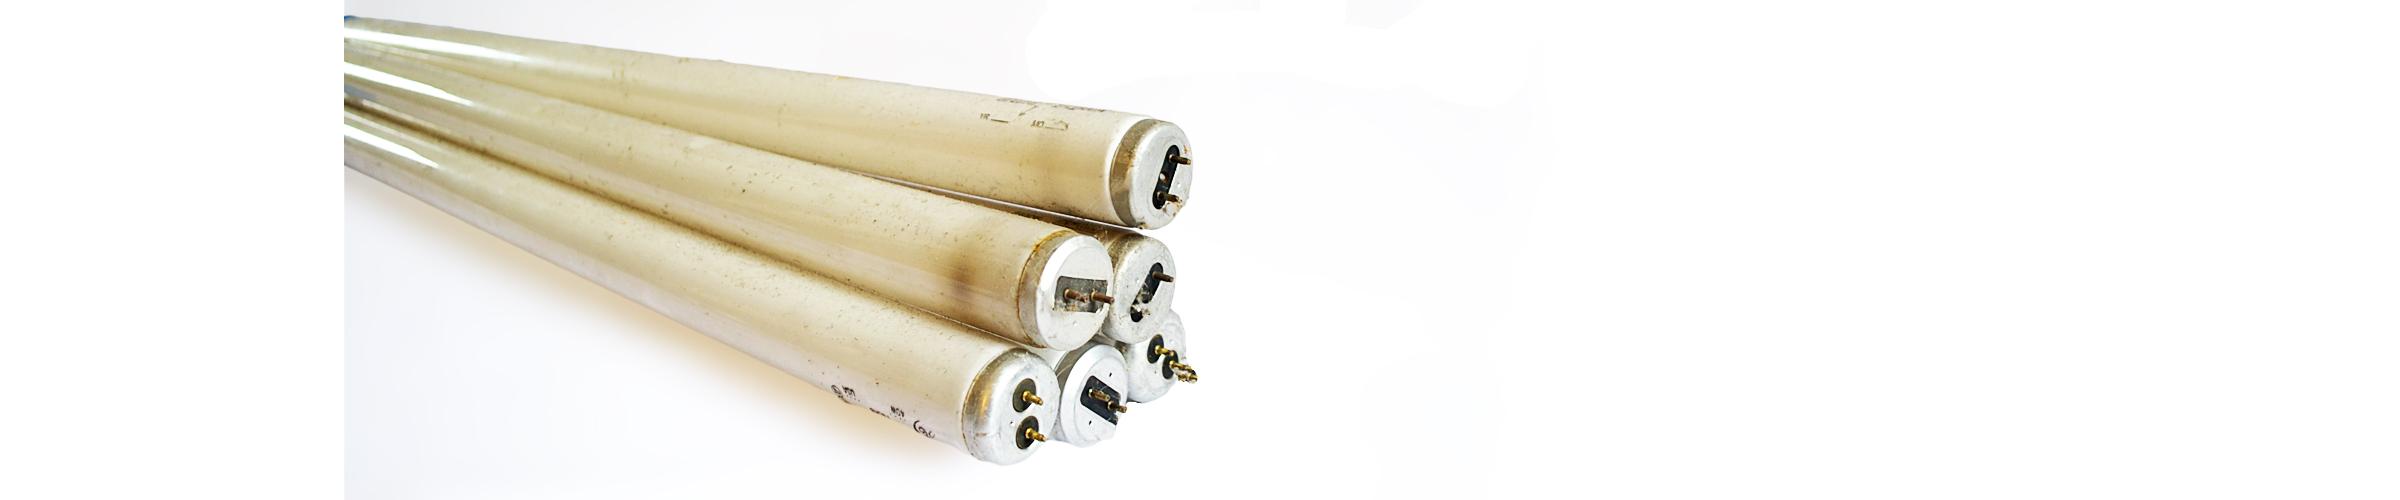 homepage-slider-lamps